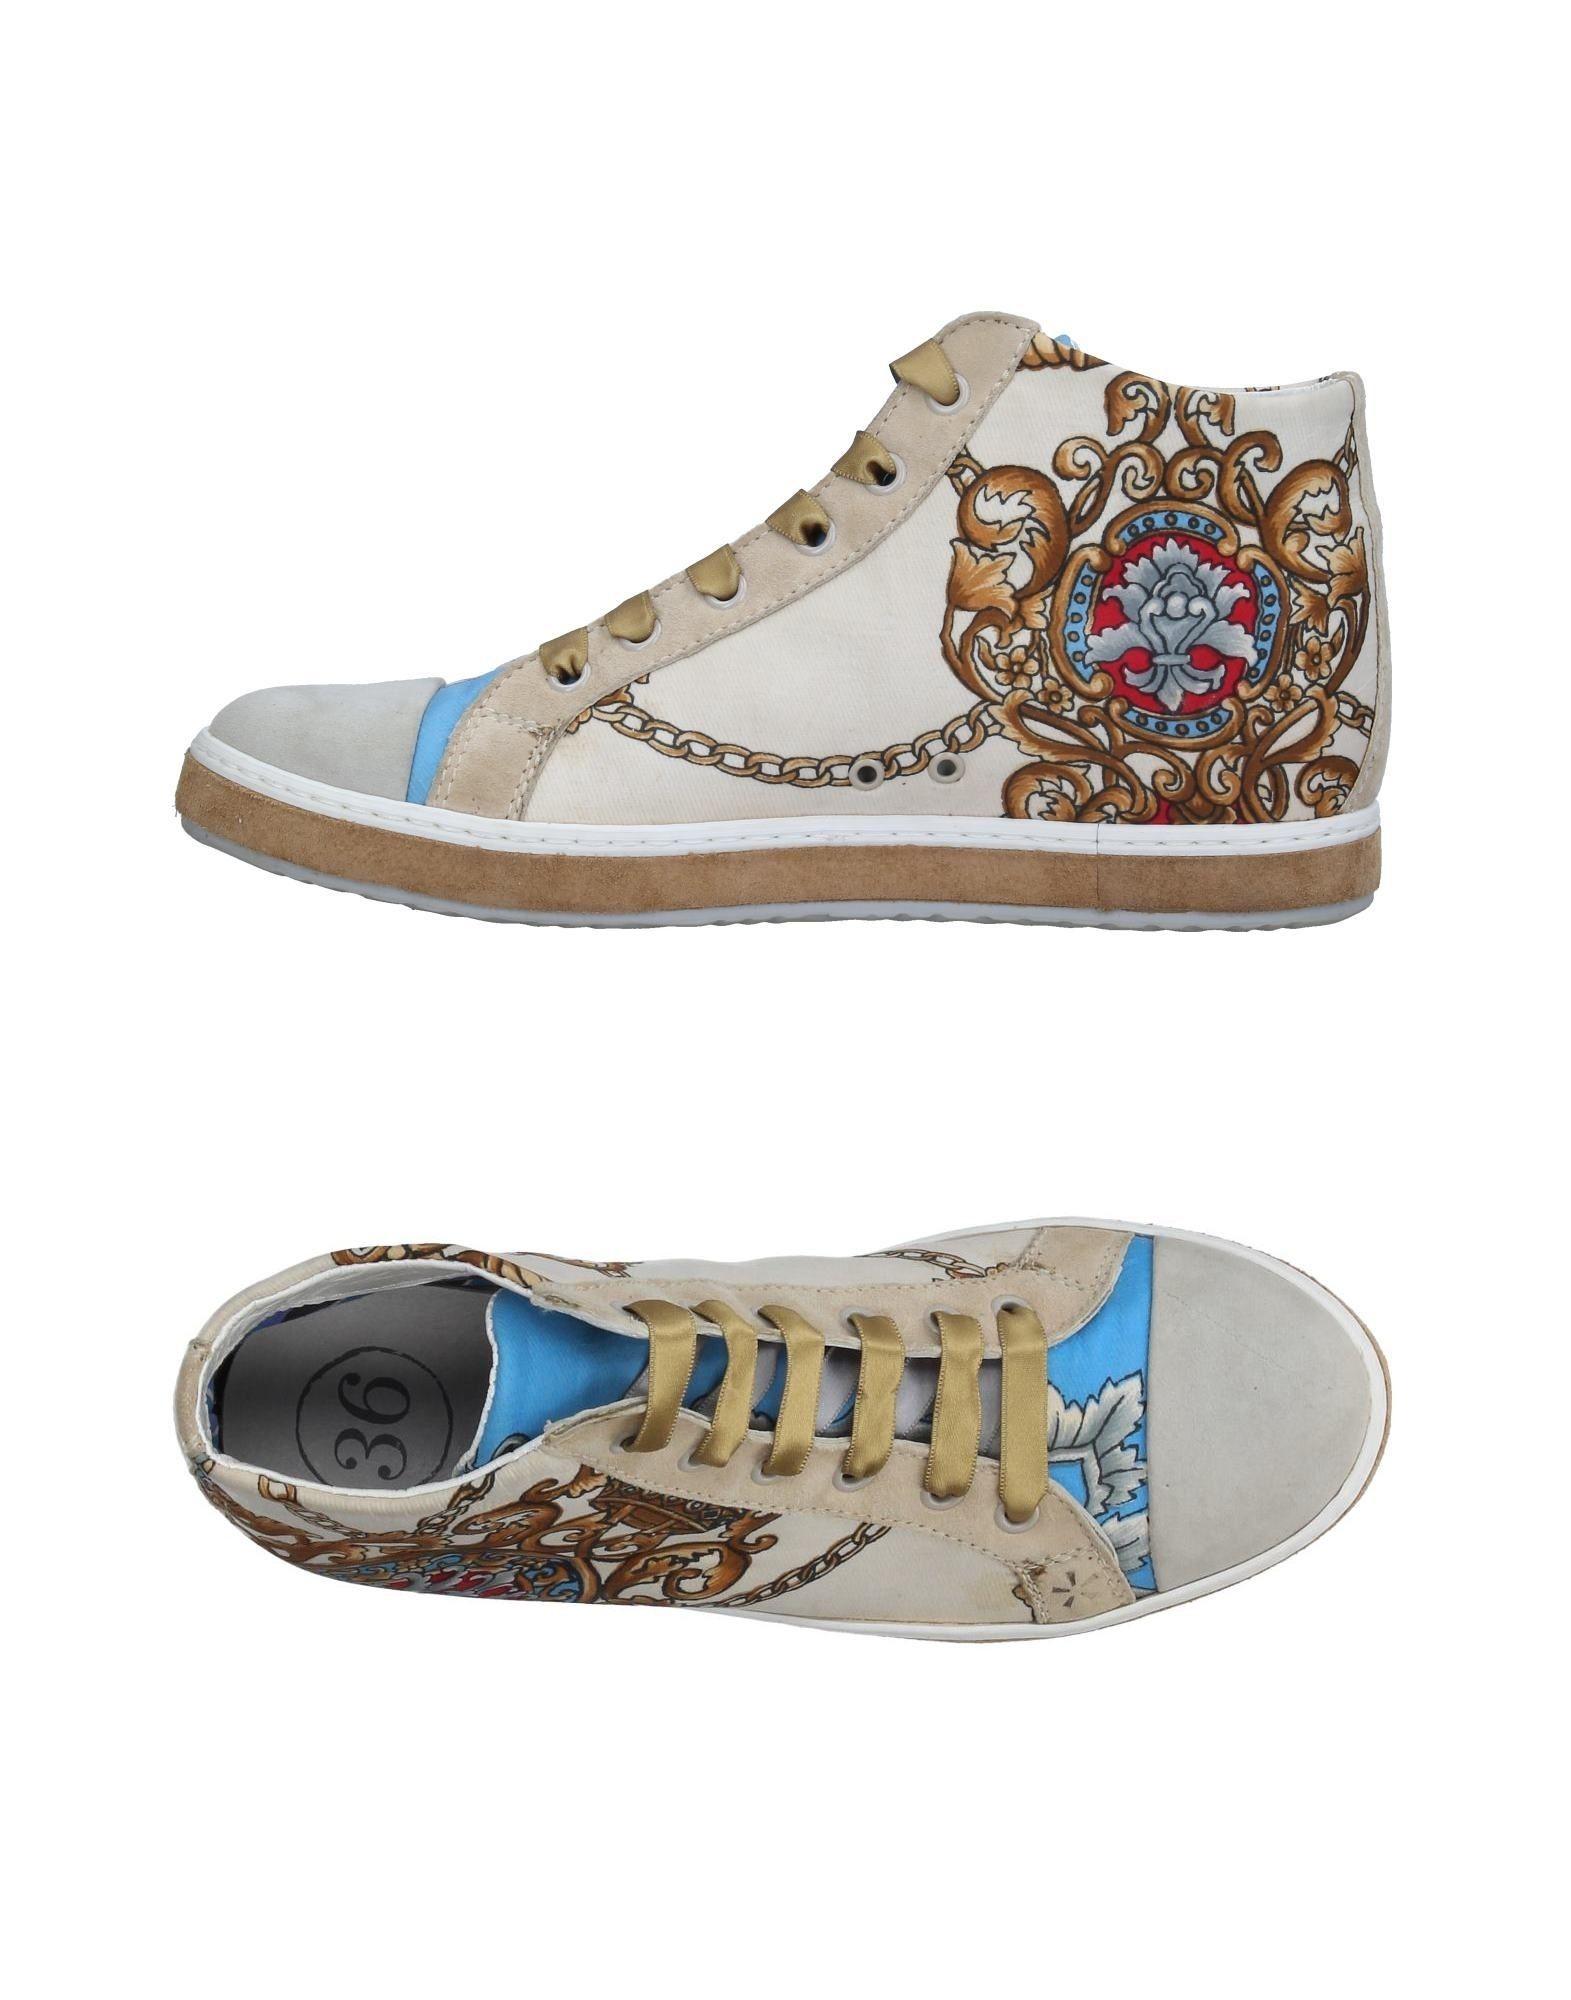 SOISIRE SOIEBLEU Damen High Sneakers & Tennisschuhe Farbe Beige Größe 5